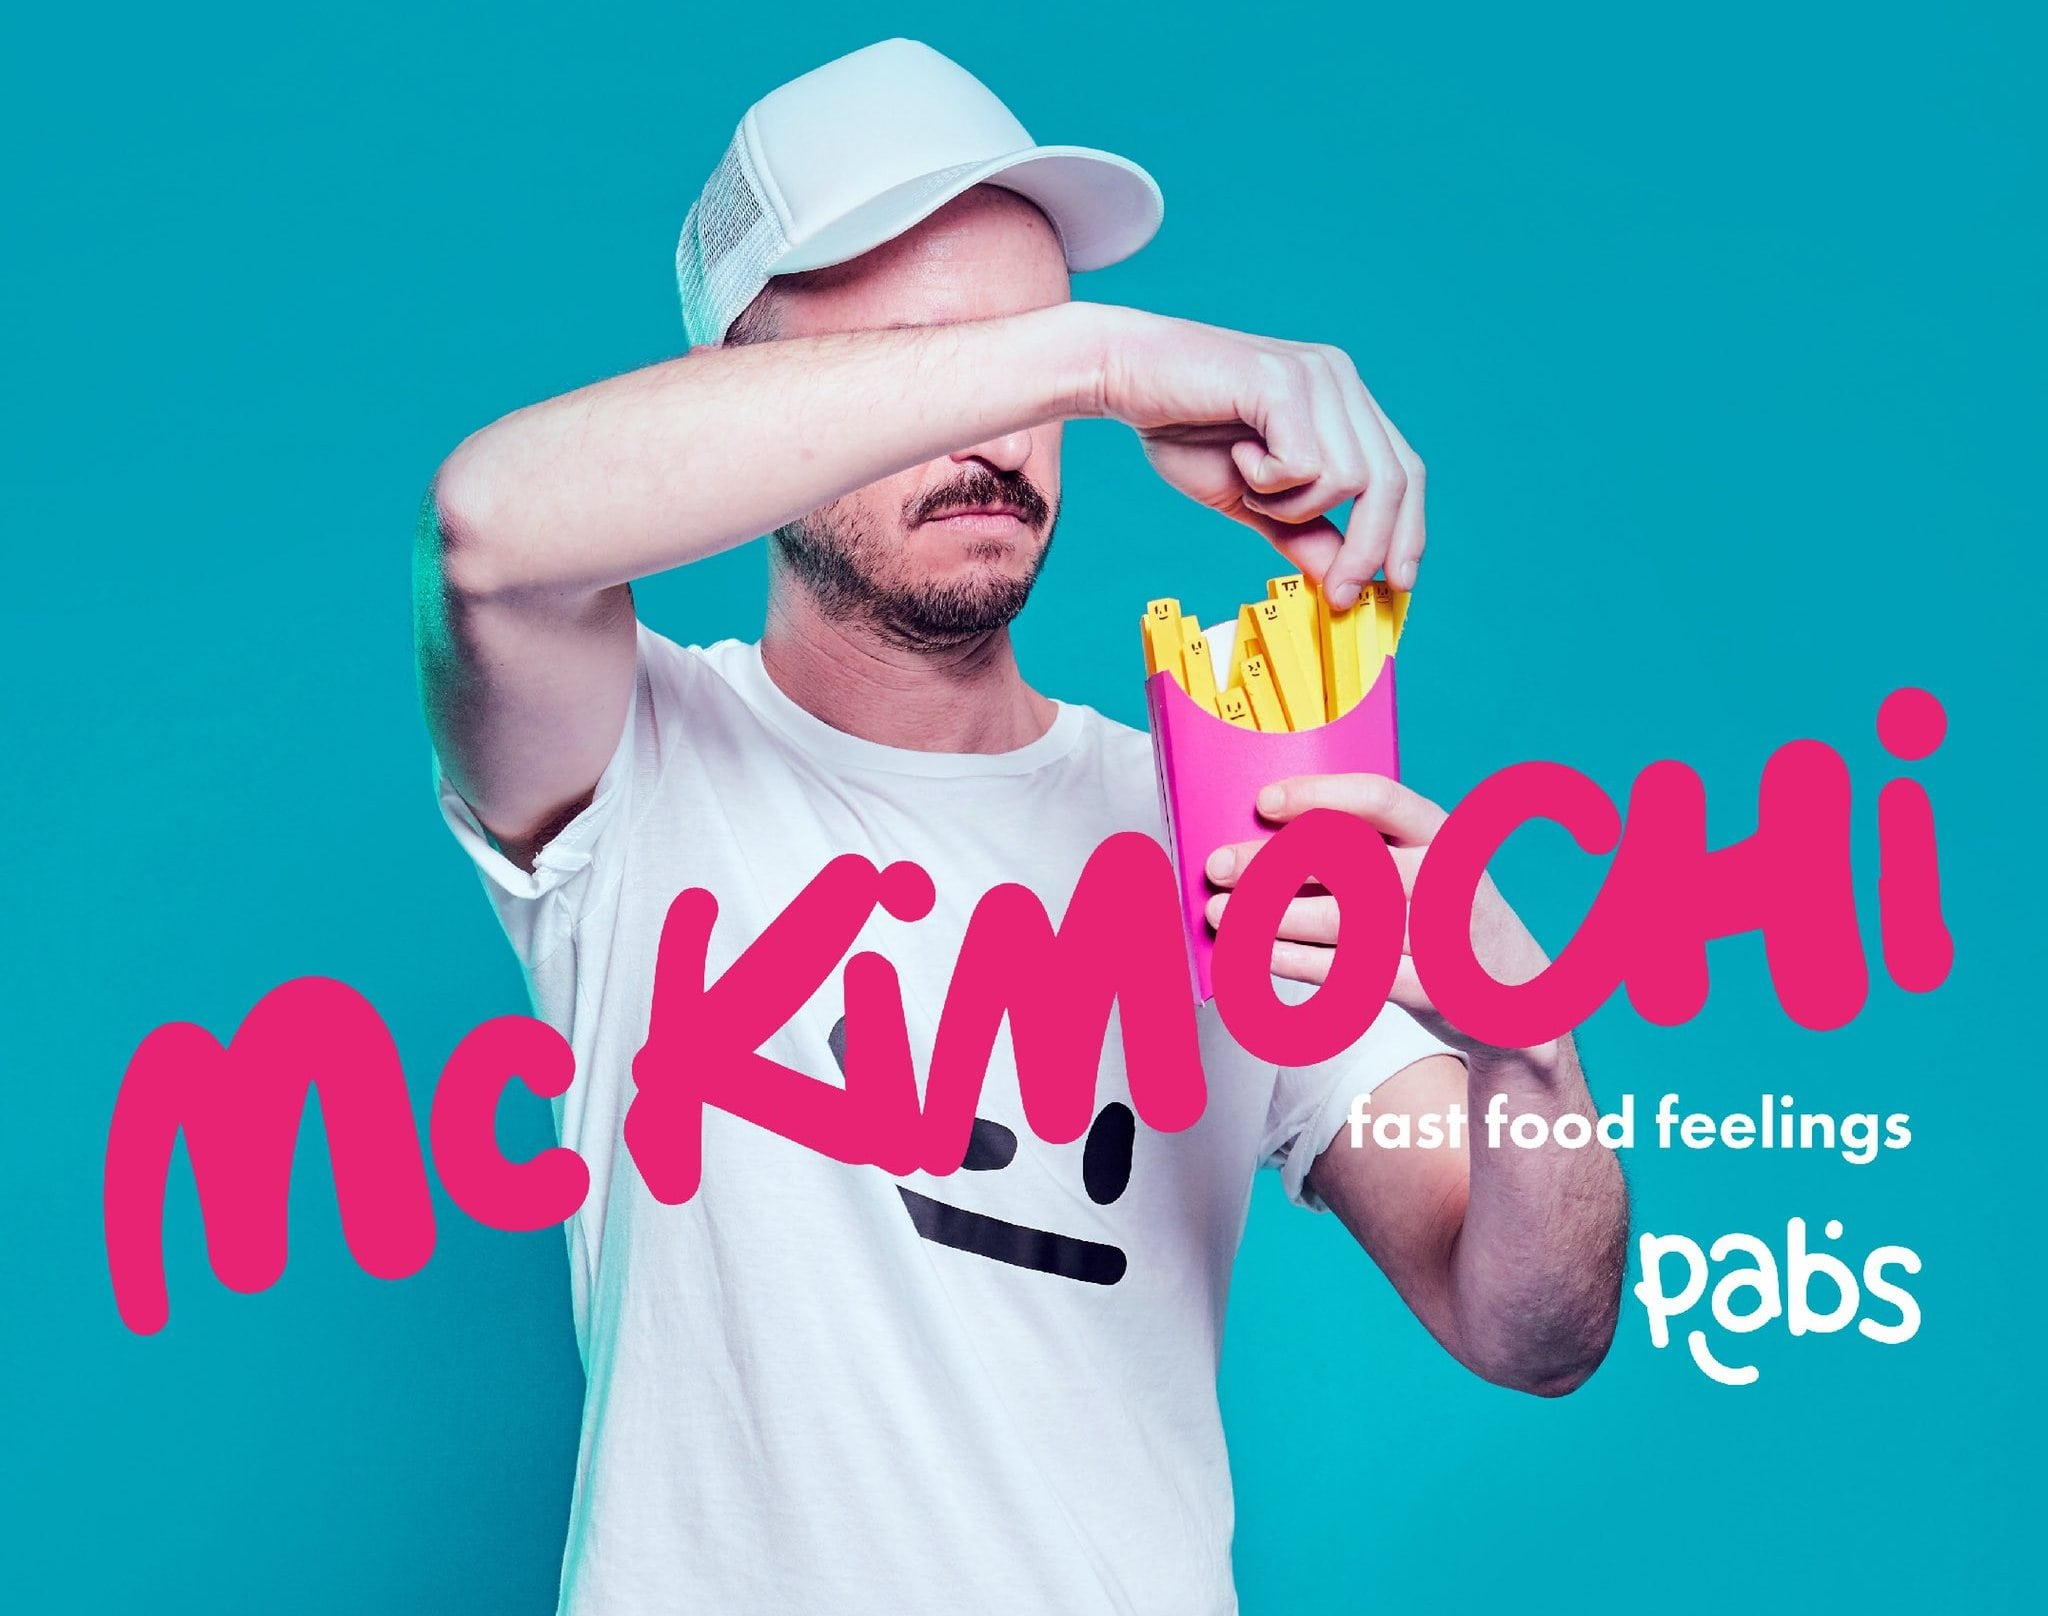 Mr Kimochi Pabs Exposicion